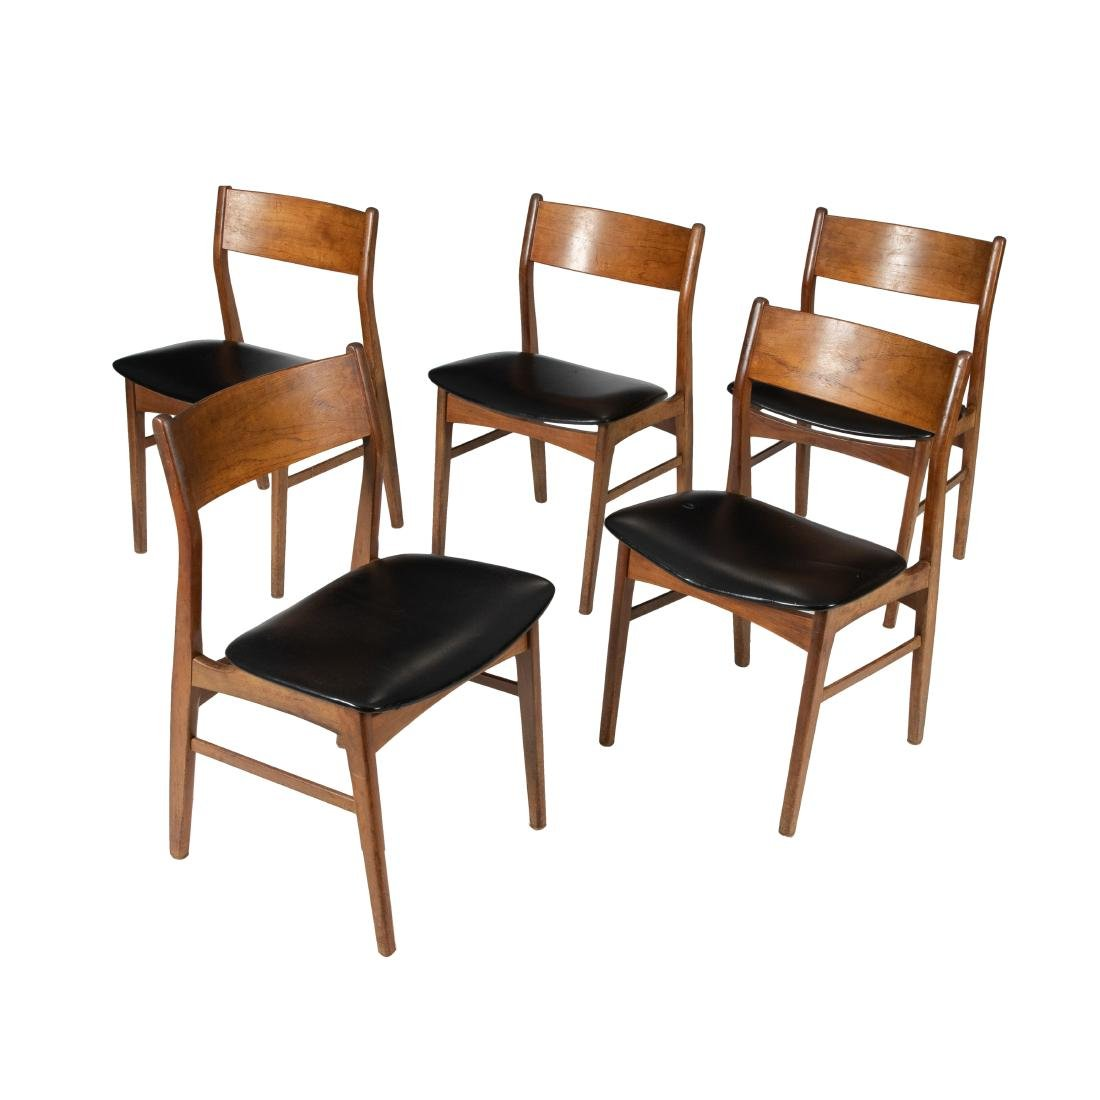 Danish Teak Dining Chairs - Five